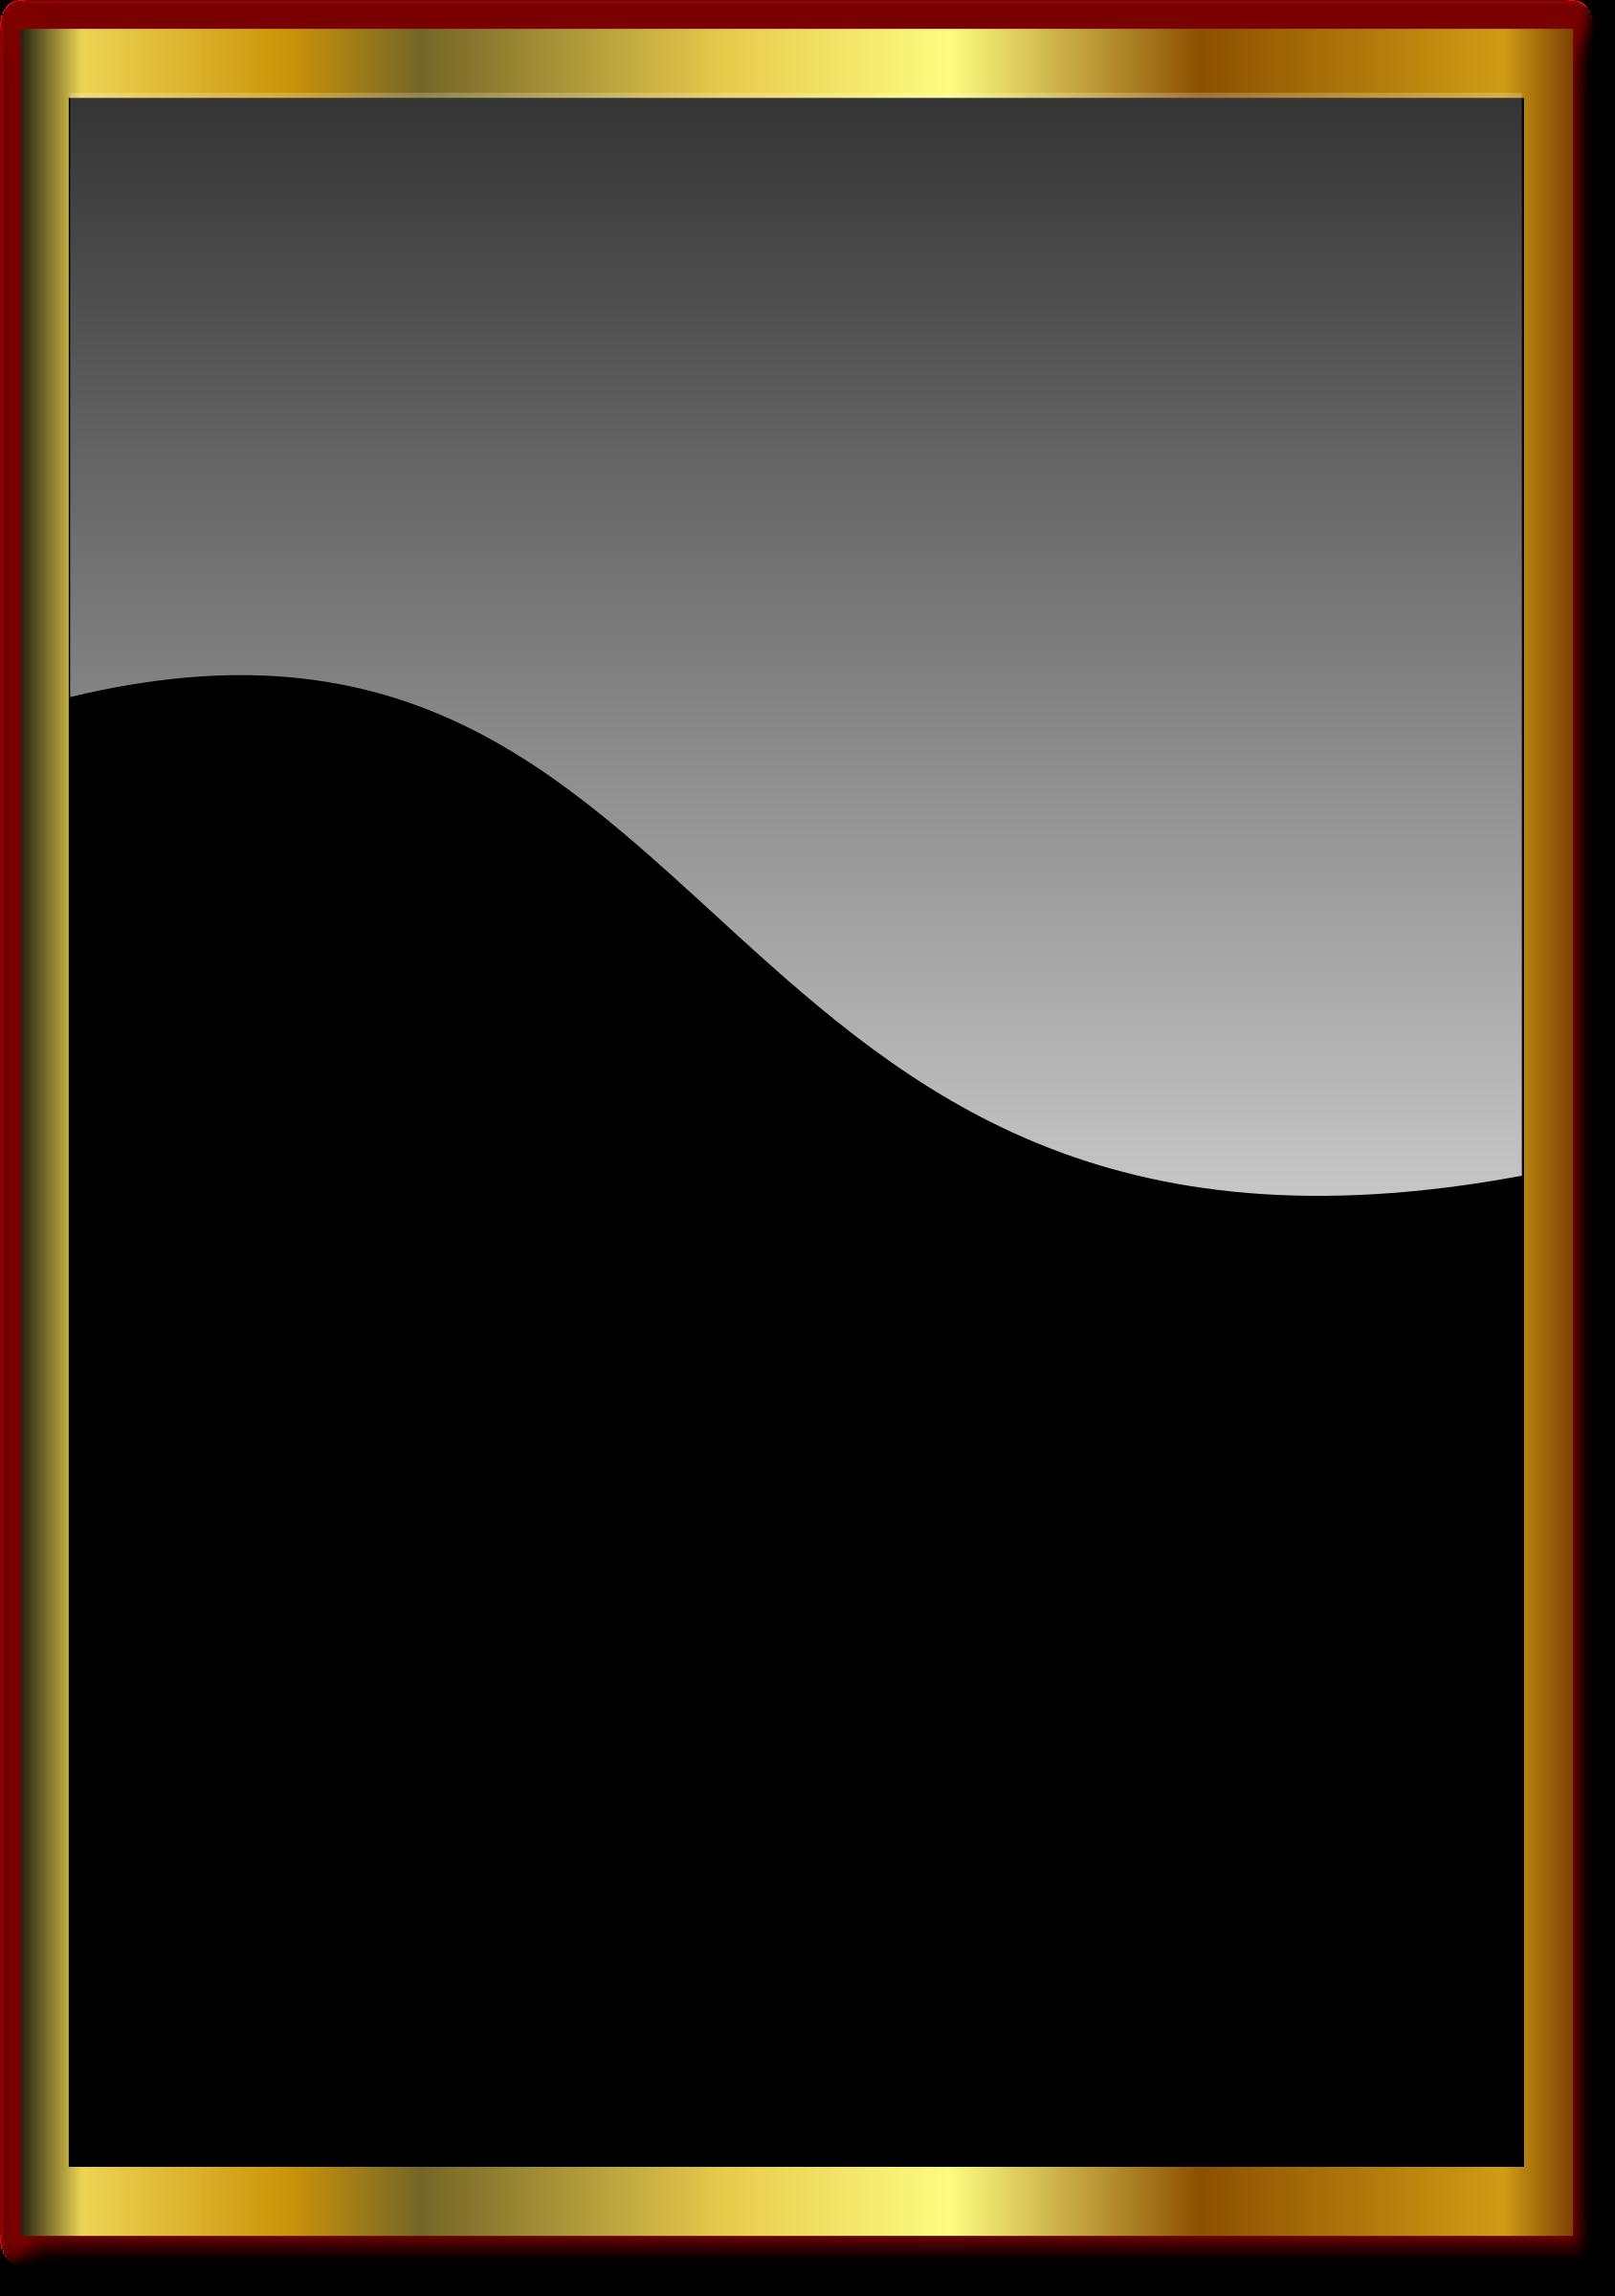 Big image png for Miroir rectangulaire ikea